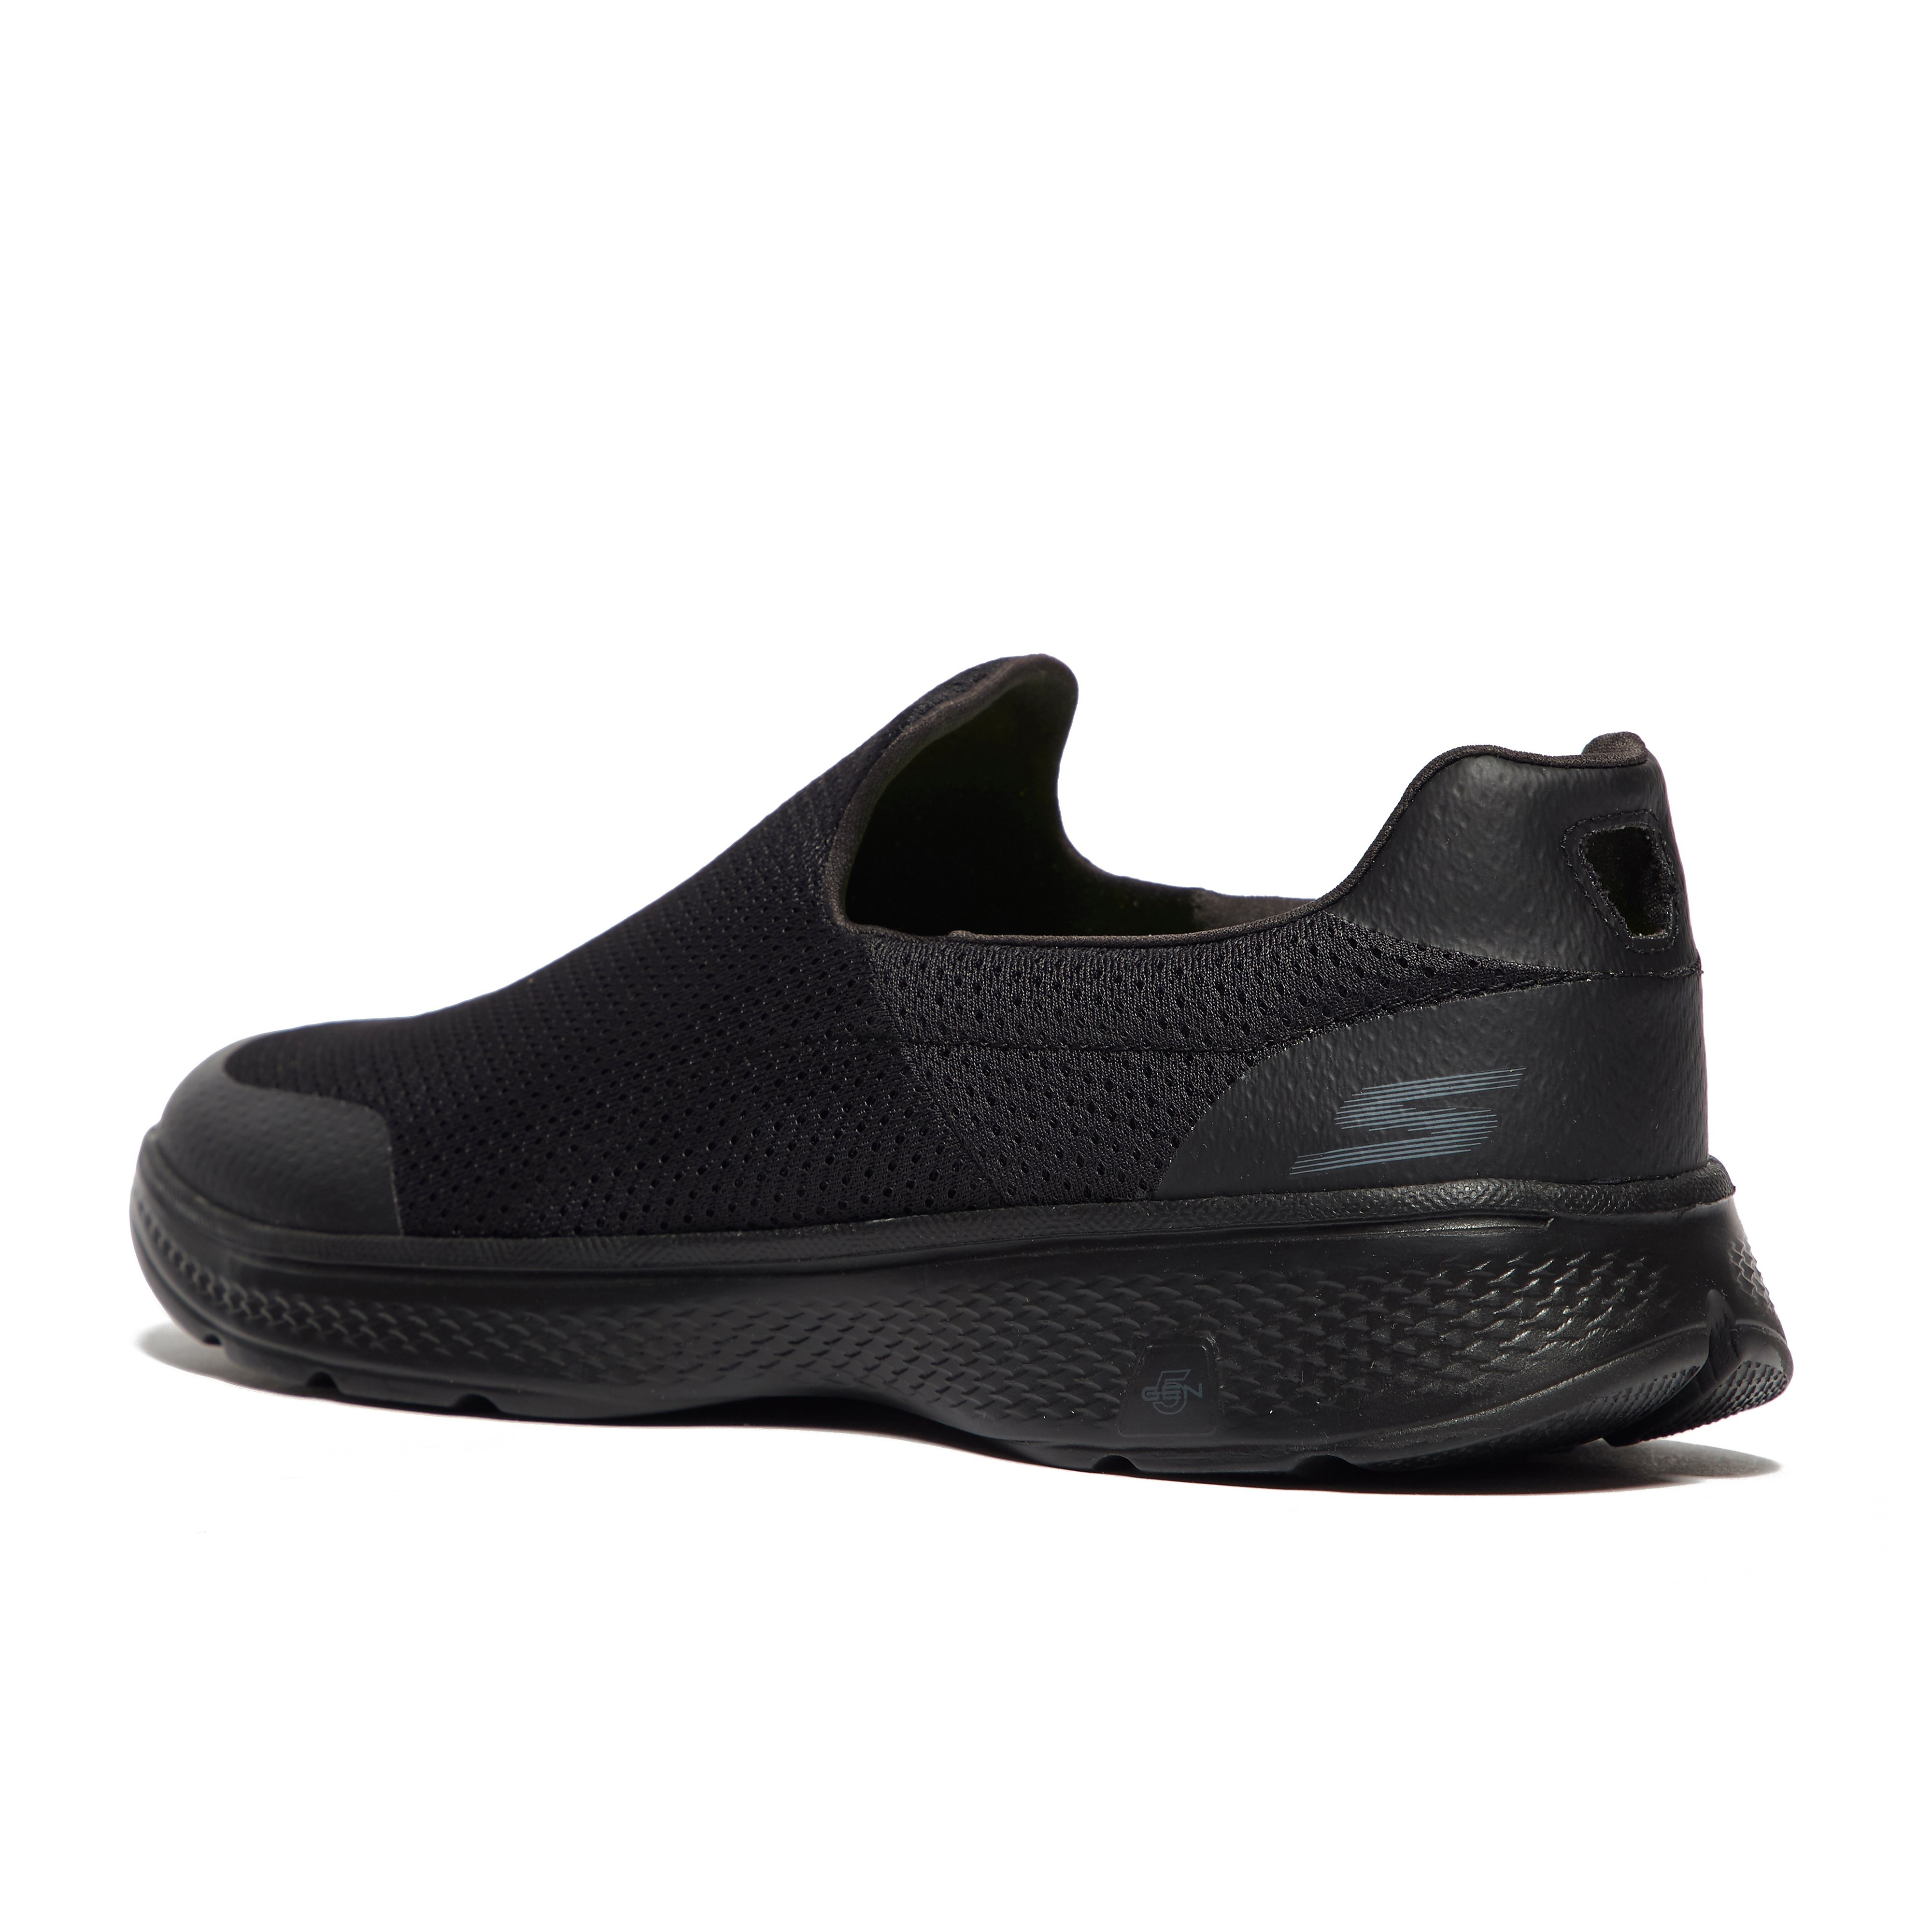 Skechers LTD GOwalk 4- Incredible Men's Casual Shoes